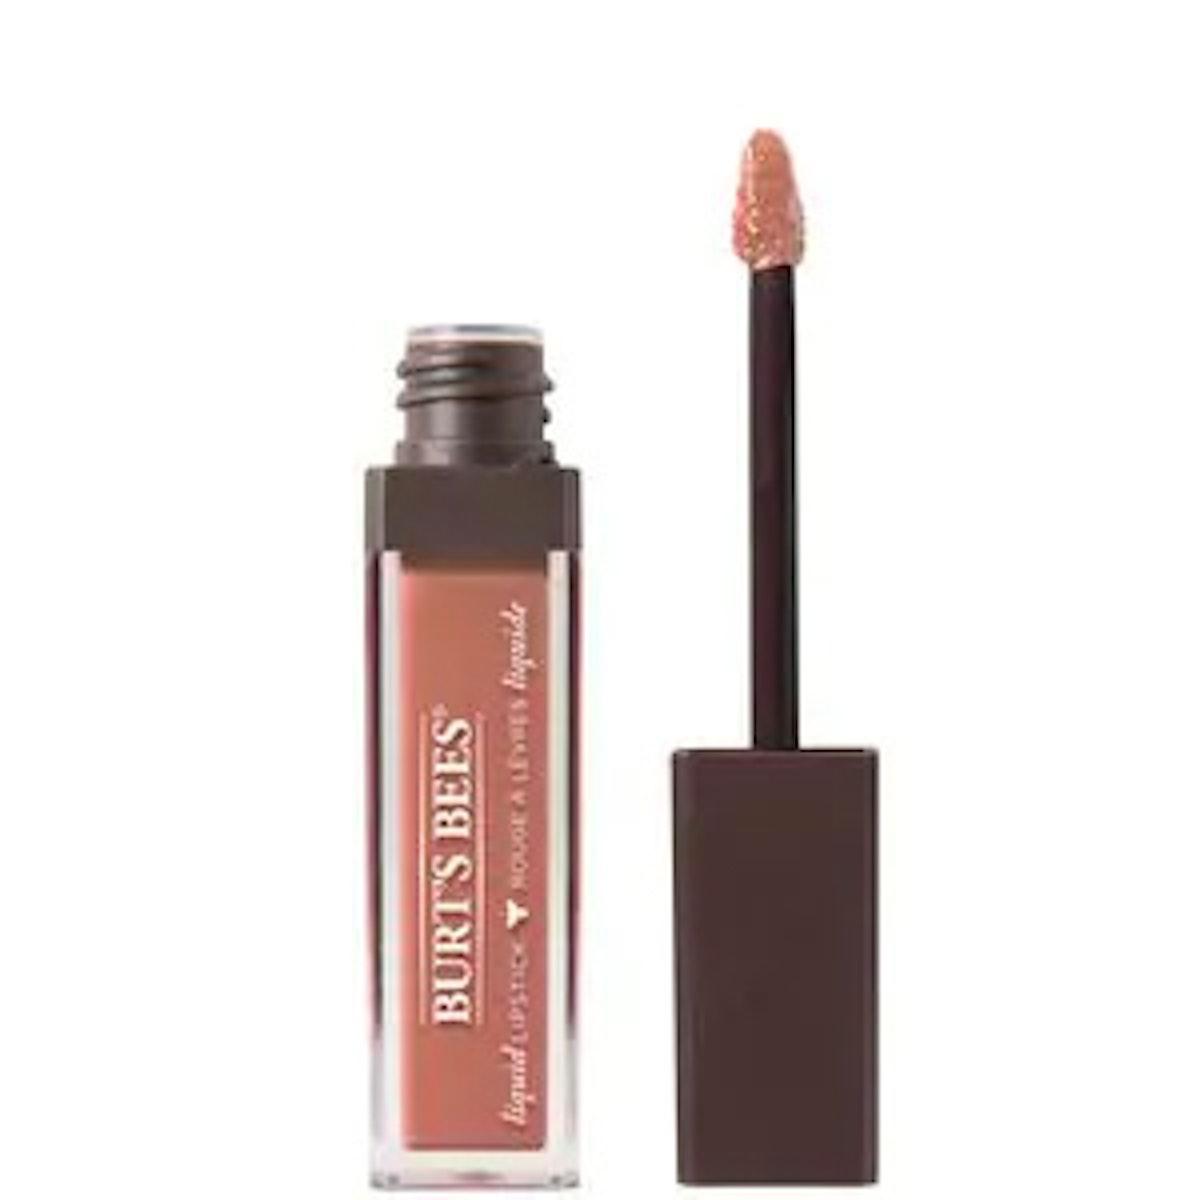 Liquid Lipstick In Niagra Nude